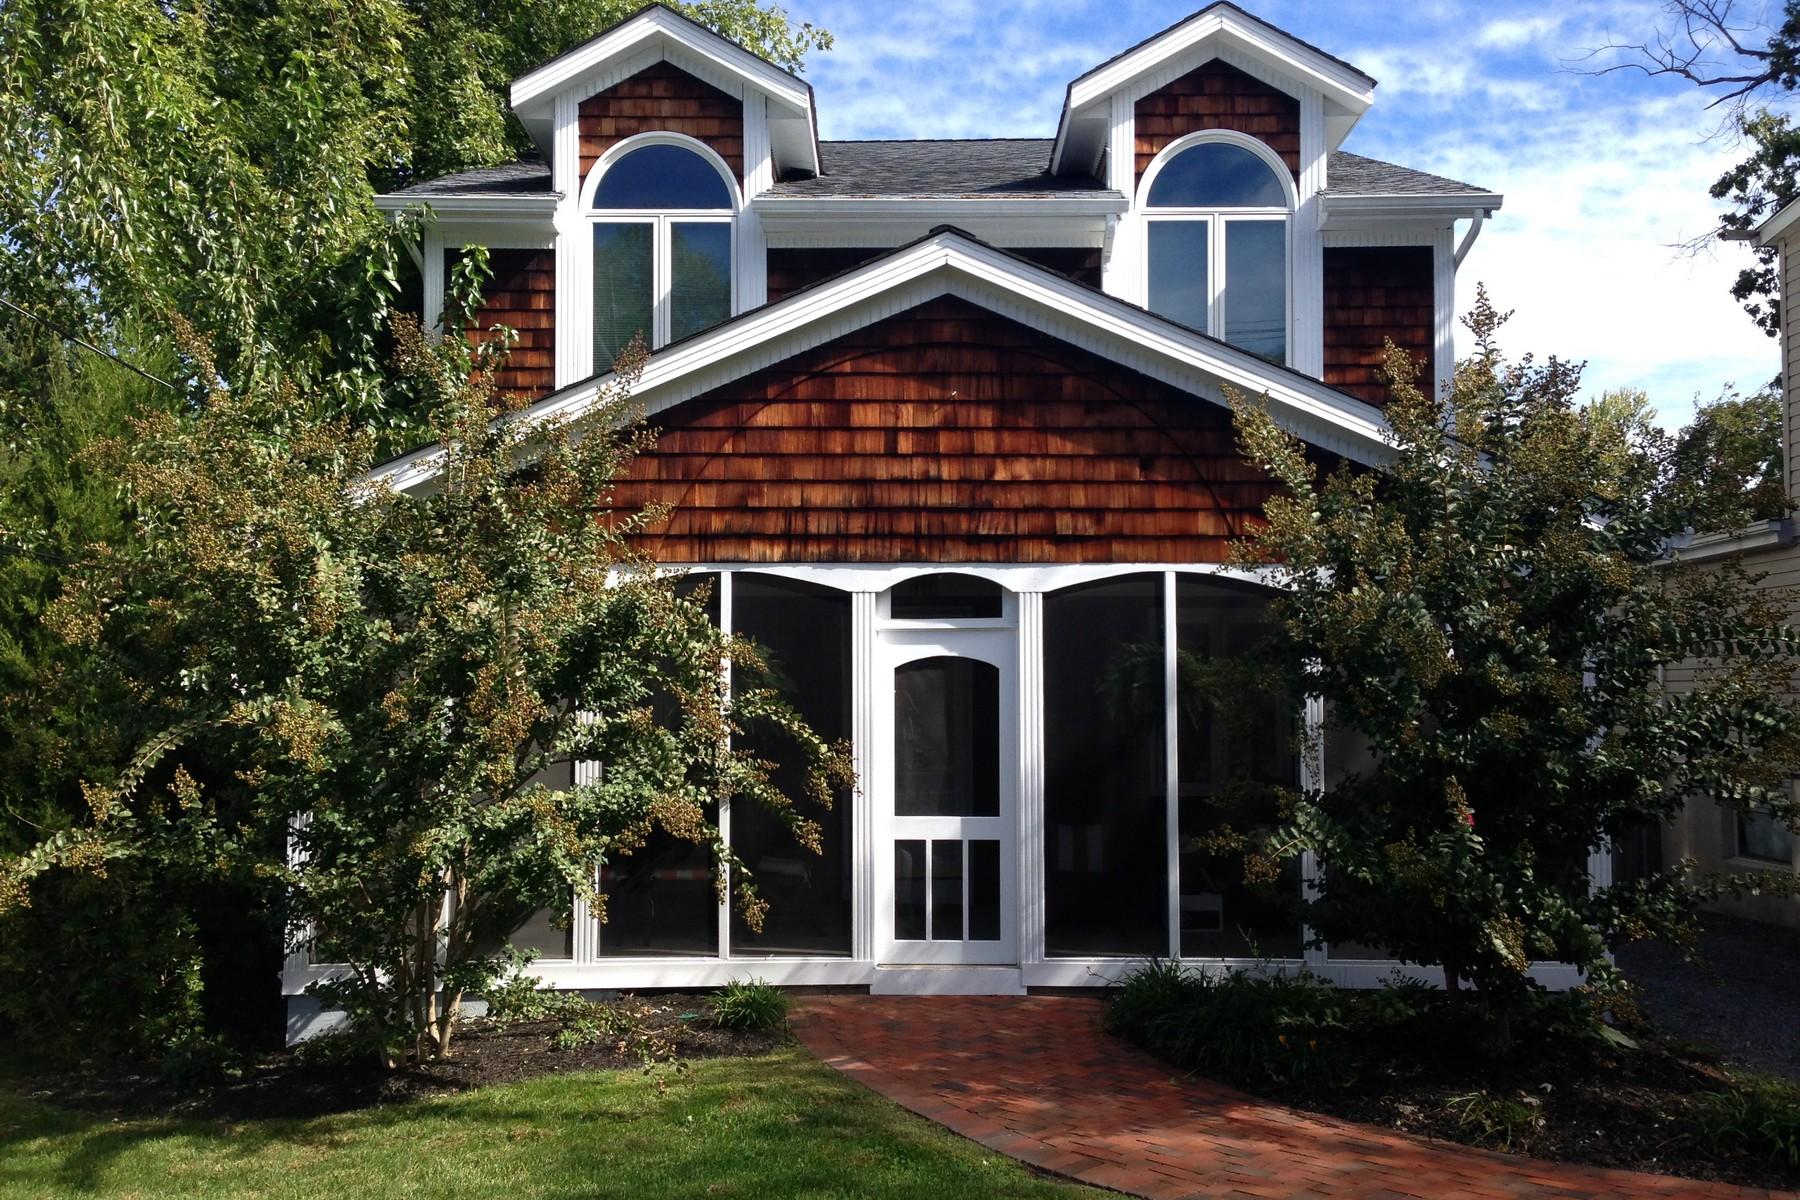 Single Family Home for Sale at 20 DeNormandie Avenue 20 De Normandie Avenue Fair Haven, New Jersey 07704 United States